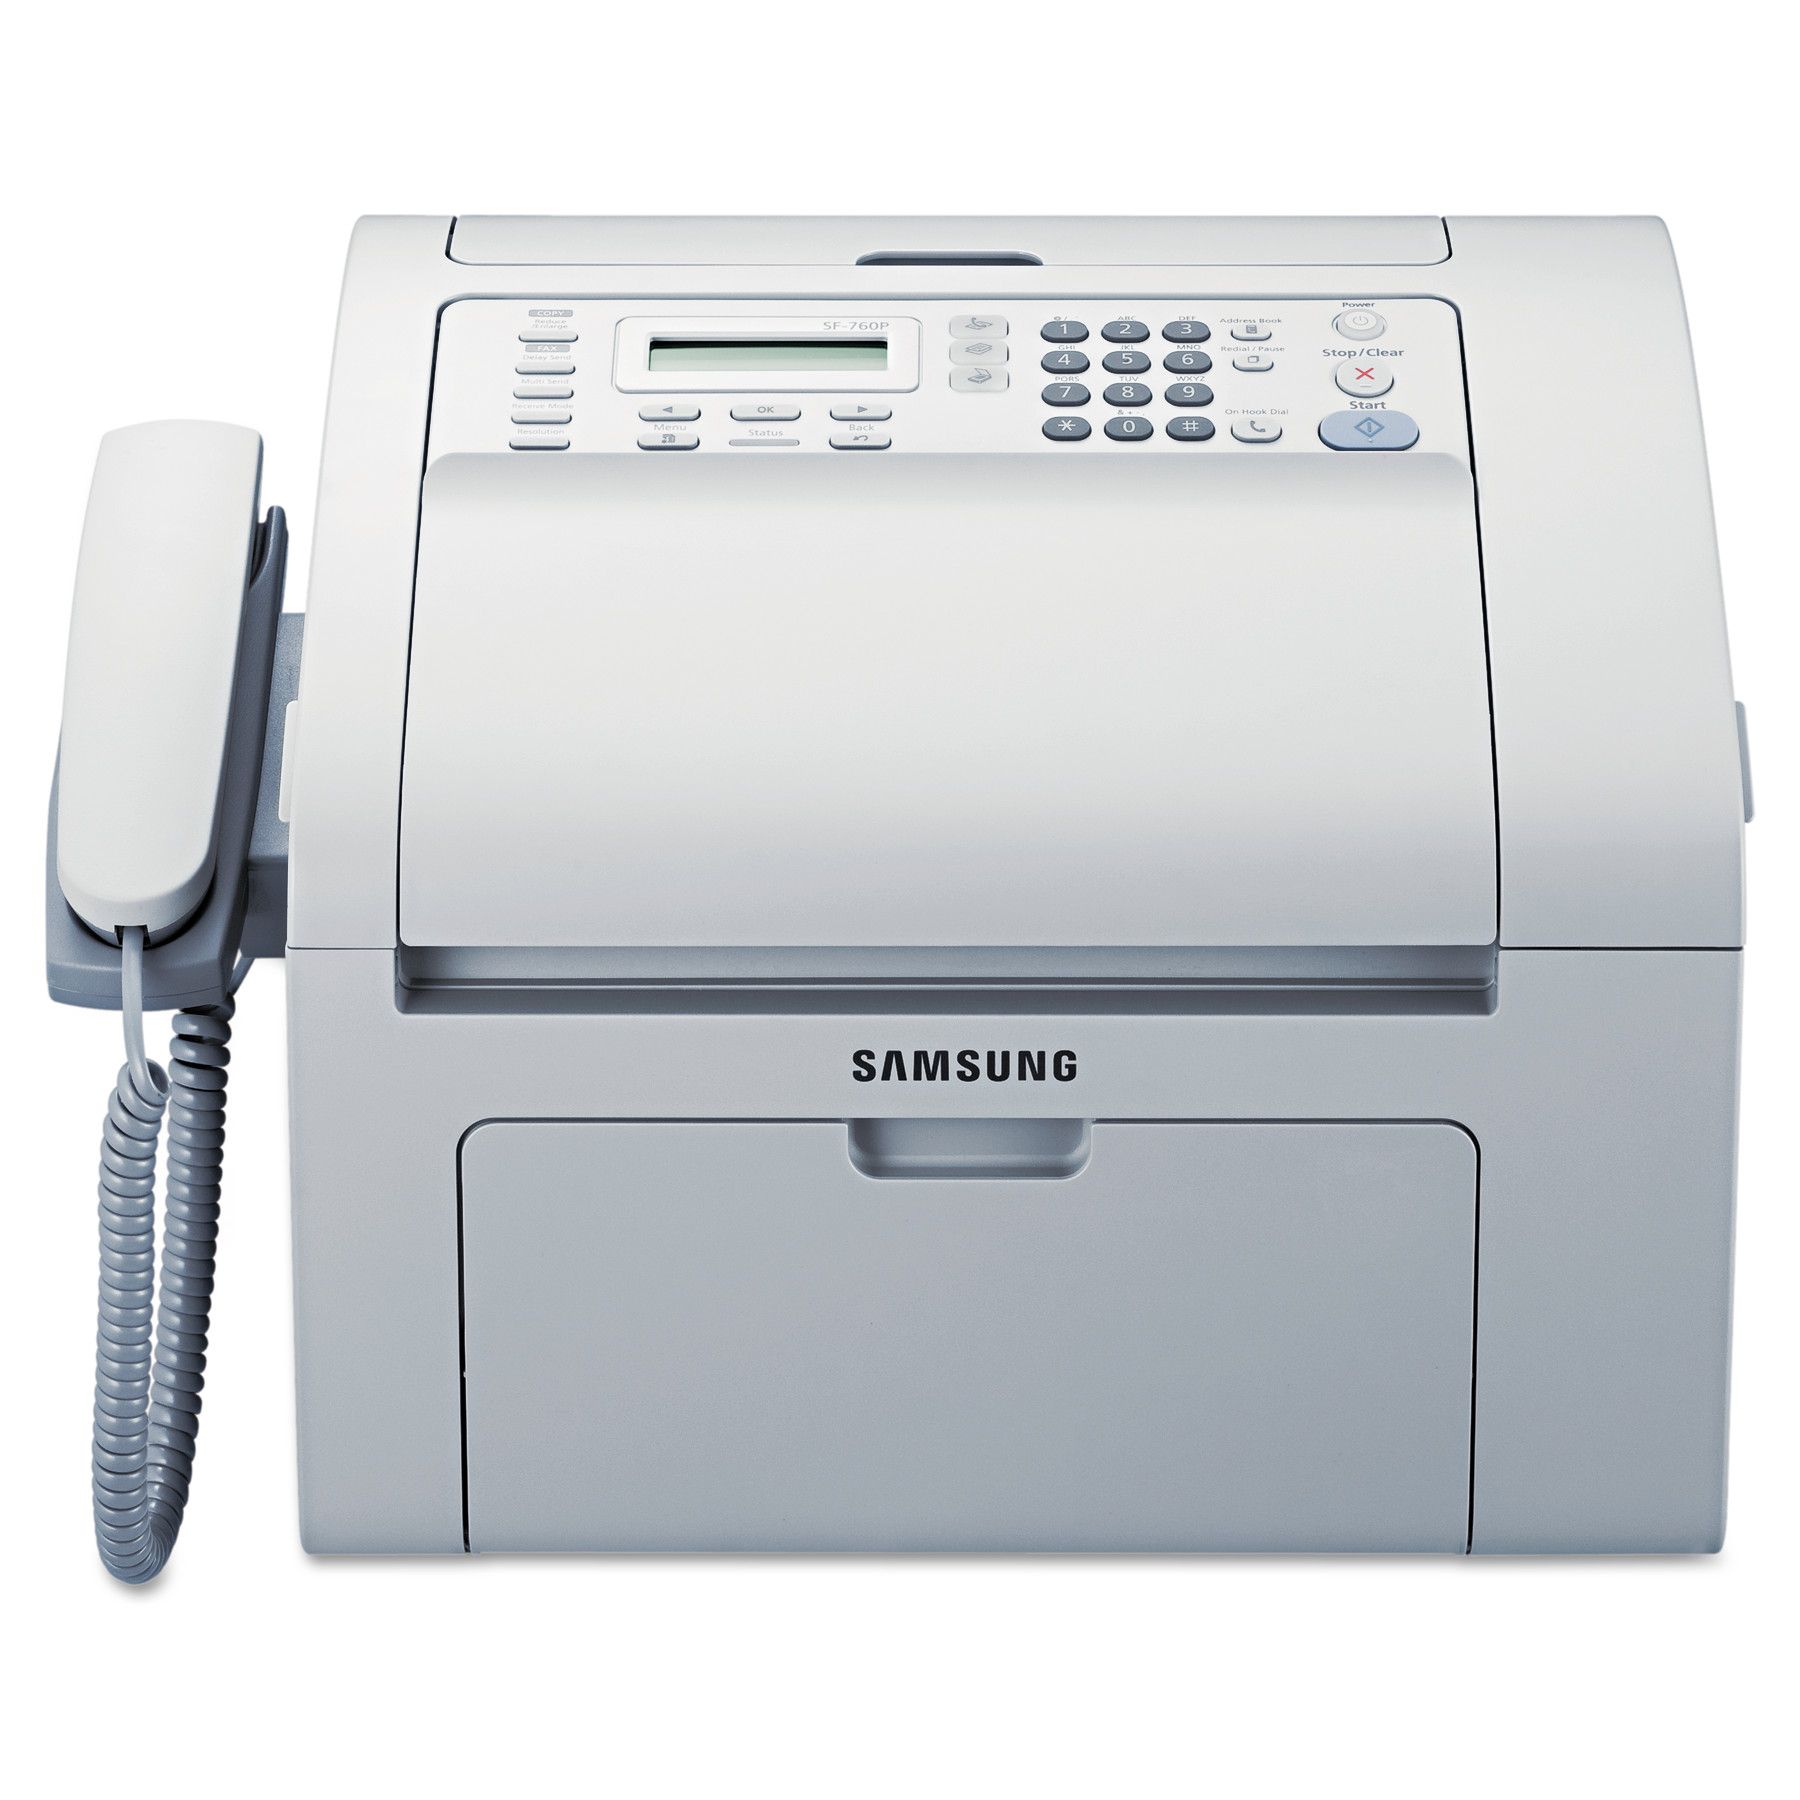 Samsung SF-760P Multifunction Laser Printer, Copy/Fax/Print/Scan